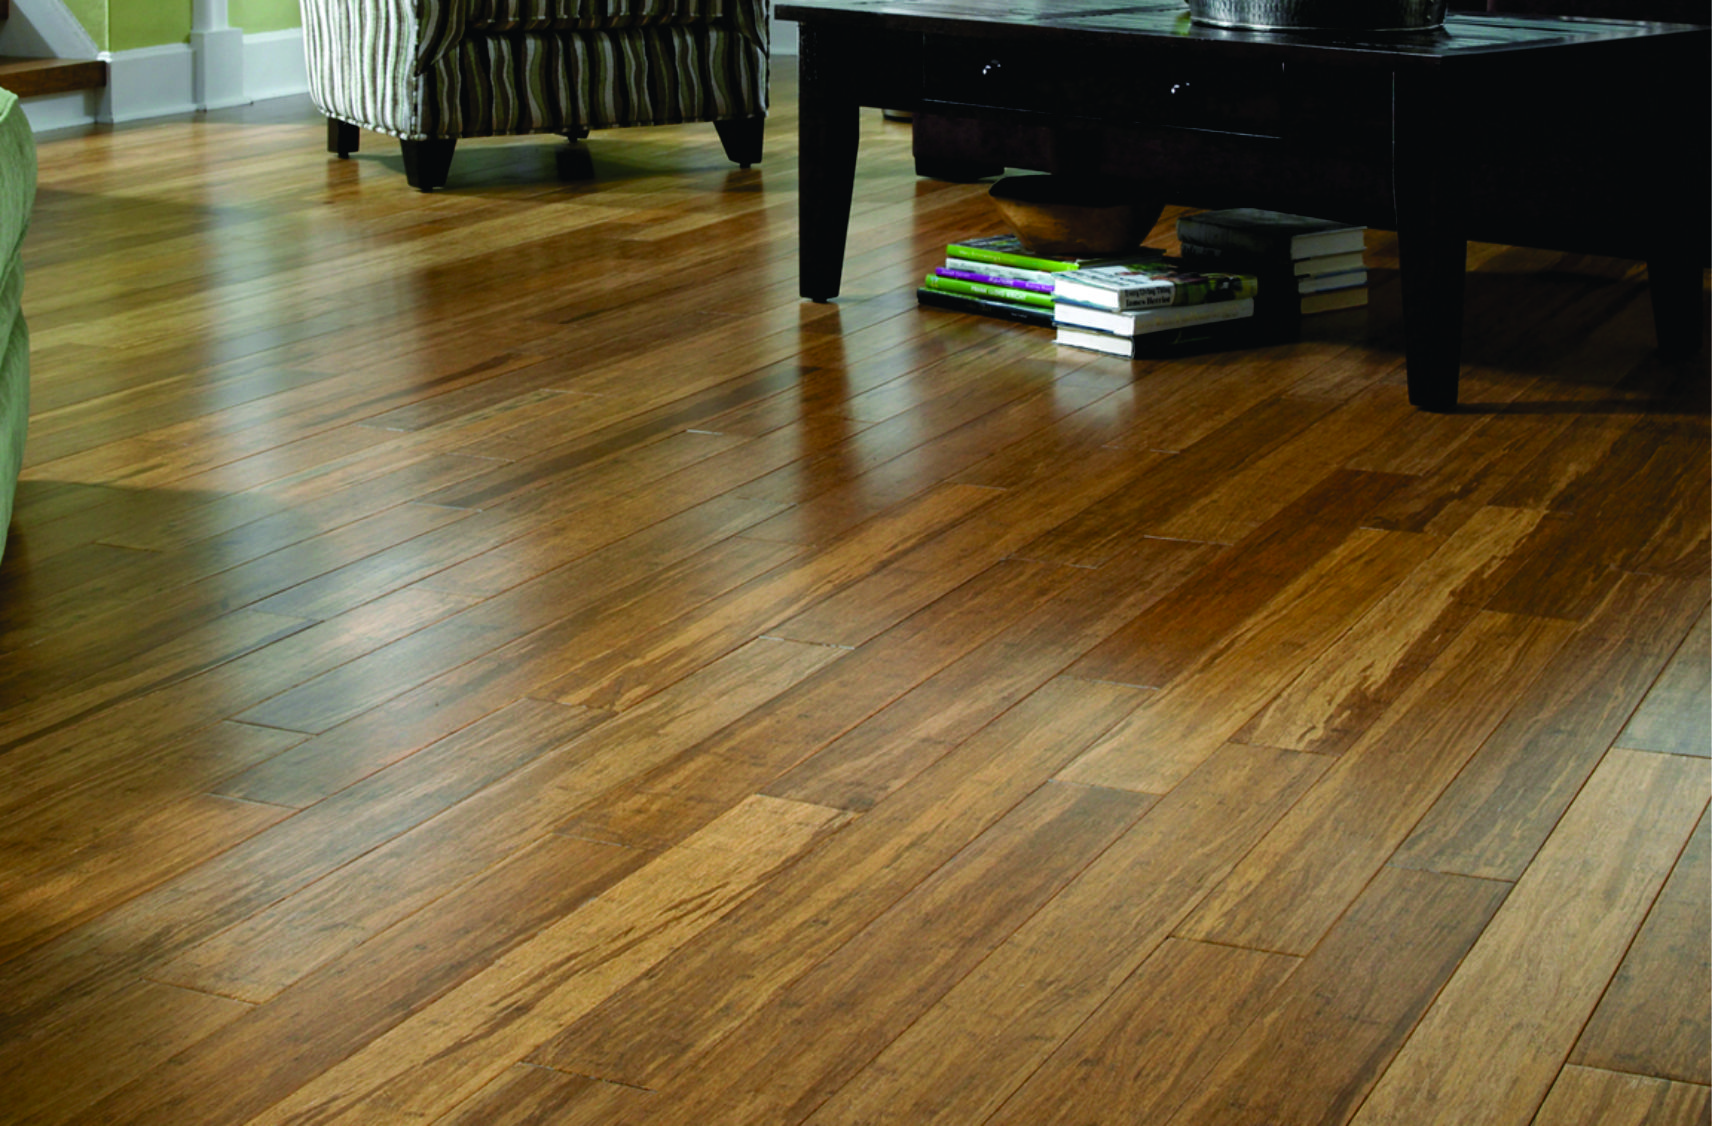 Bamboo Laminate Flooring Isa Arch Com 571 Homeideas Homedesign Homedecor